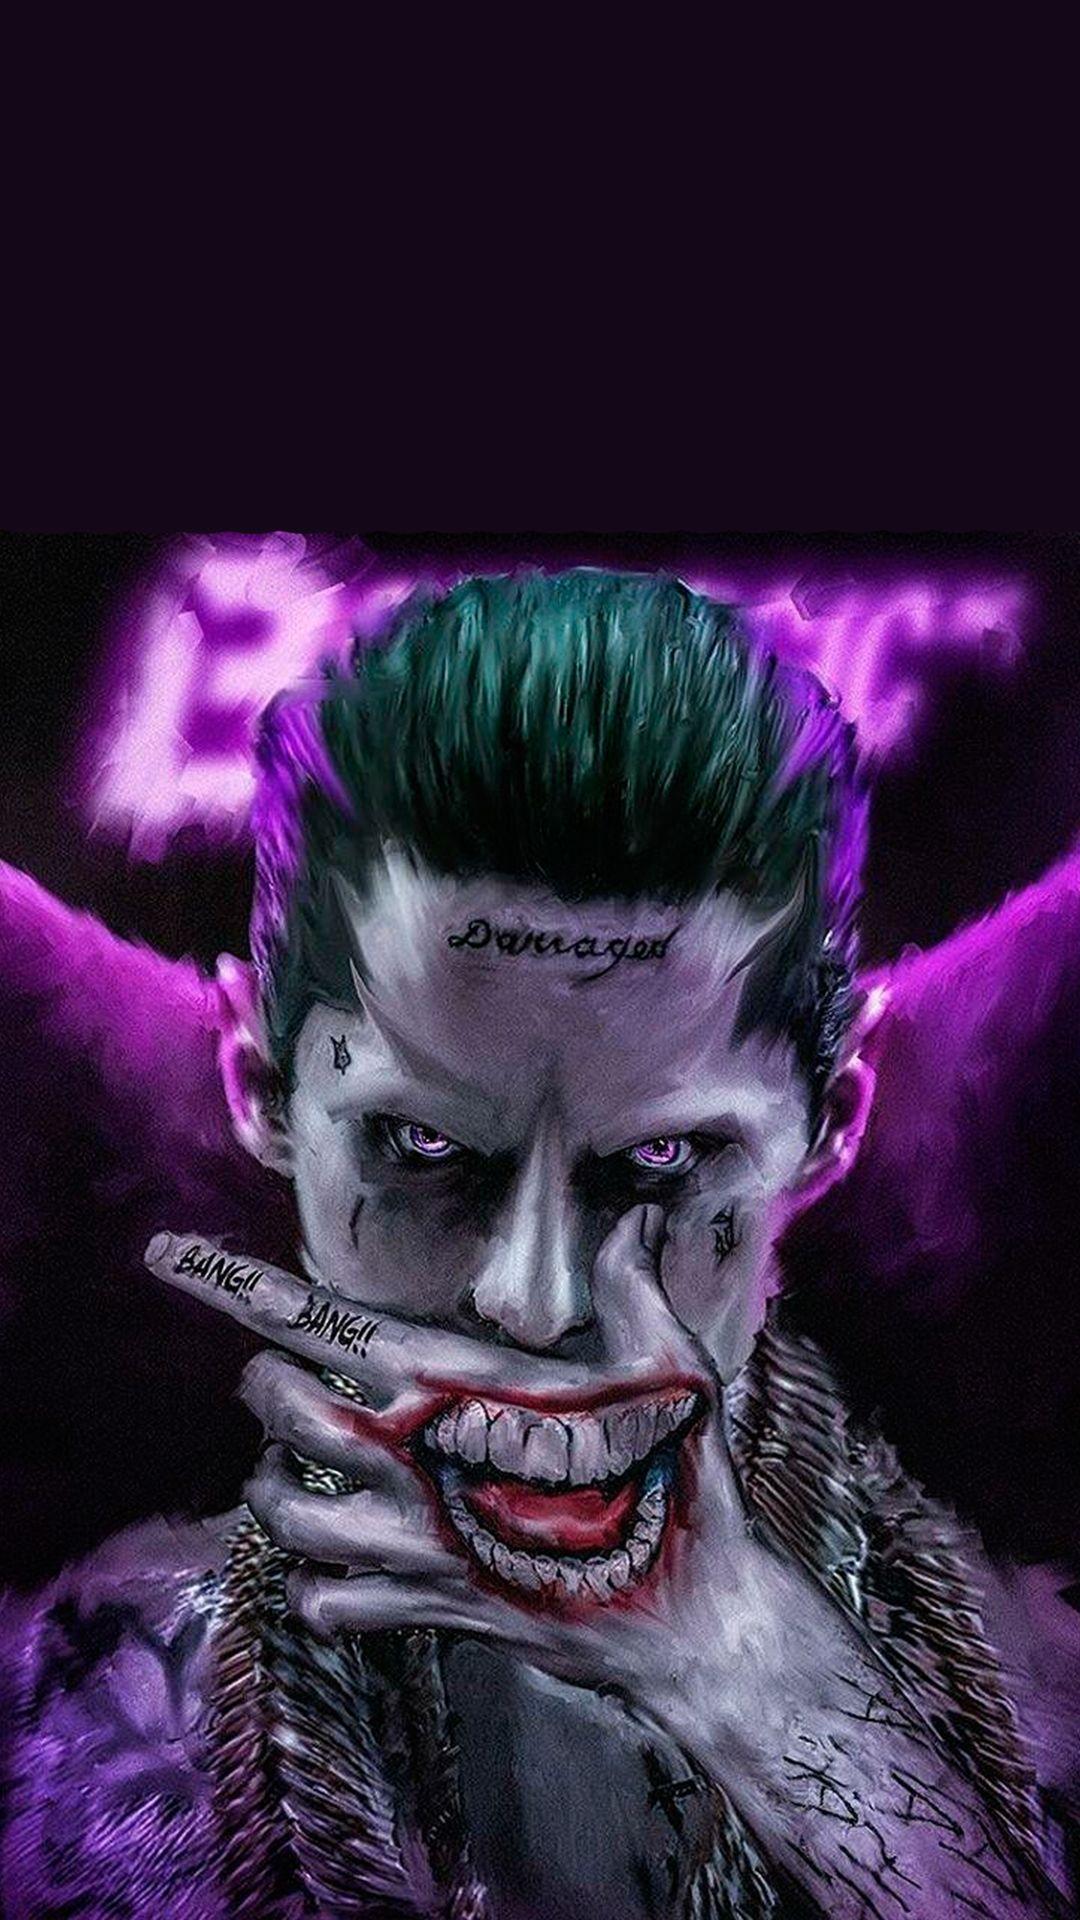 Joker Desenhos Do Coringa Fotos Coringa Tatoo Coringa